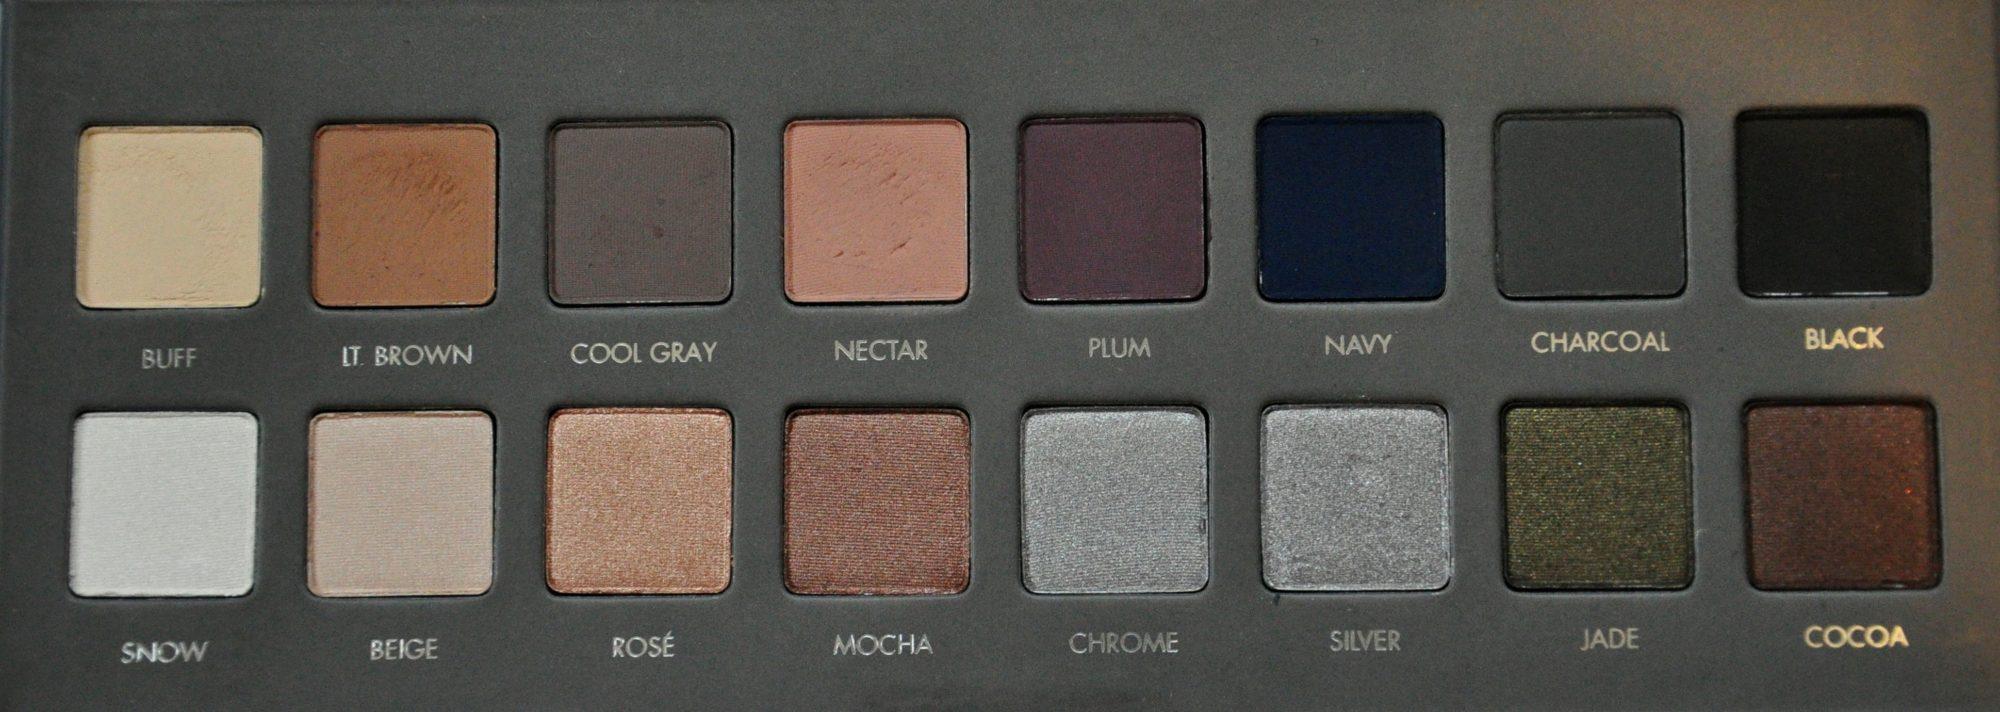 lorac pro palette 2 swatches